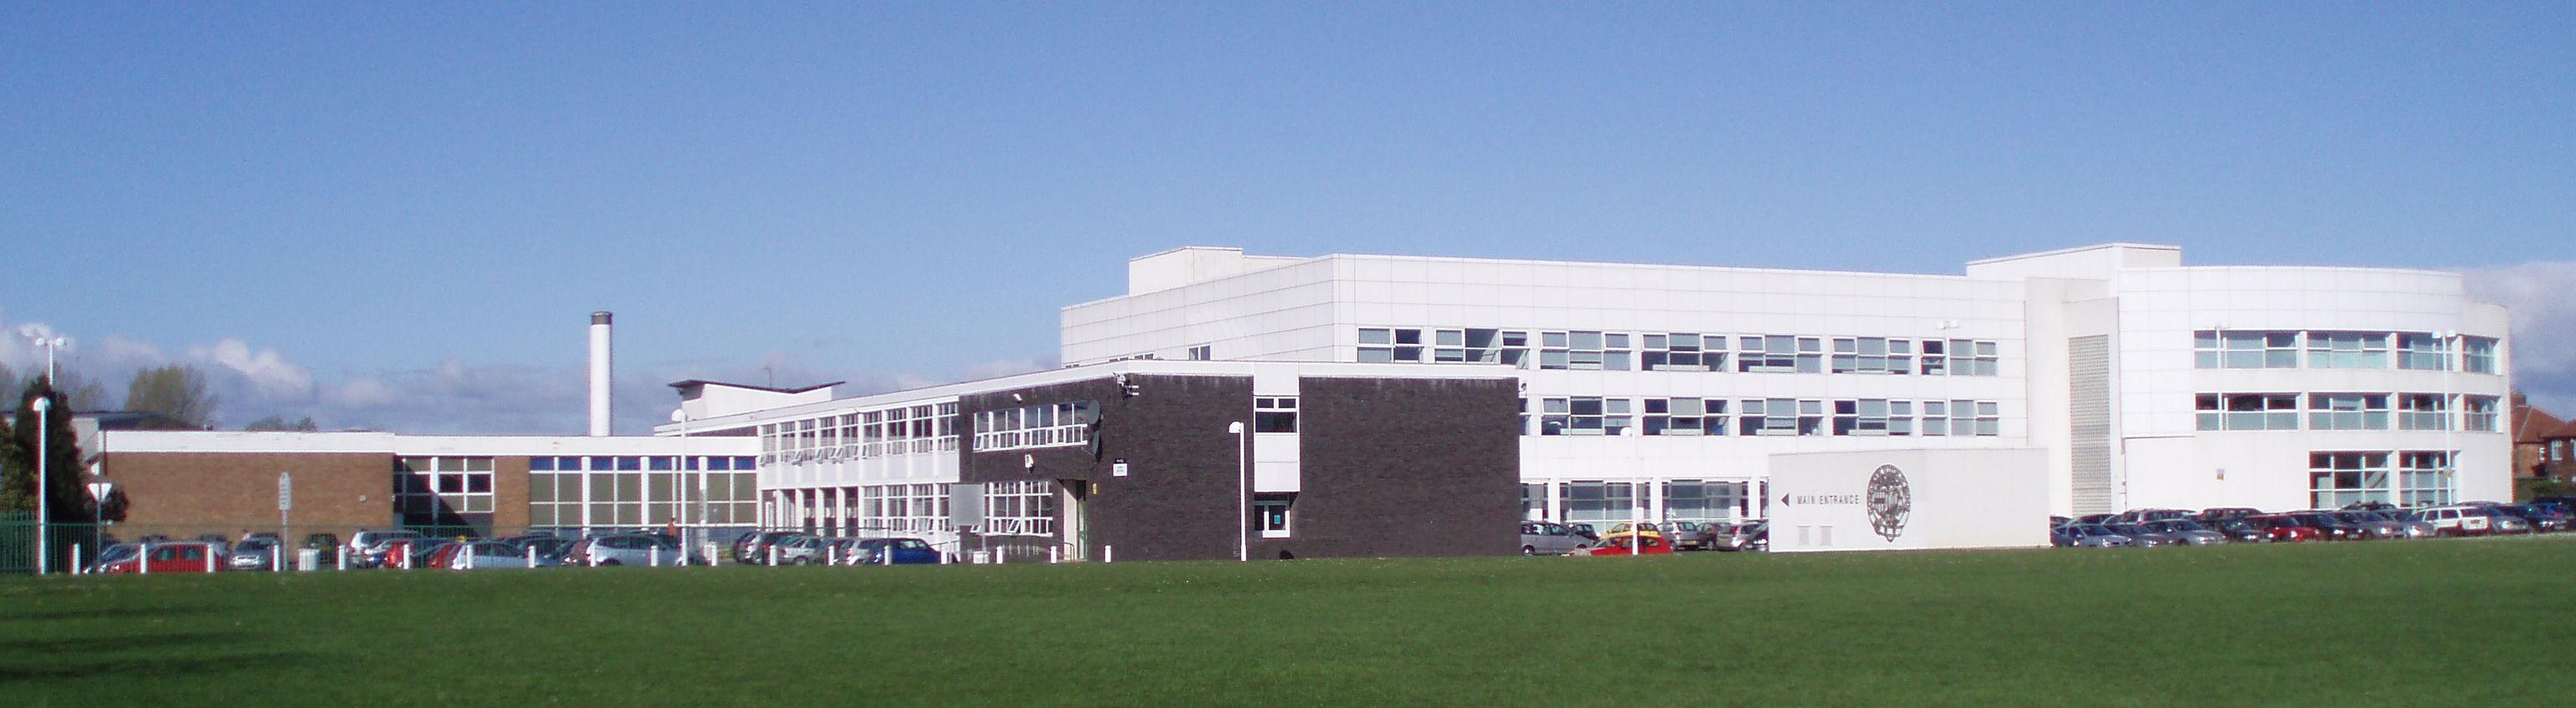 Description gosforth high school building jpg